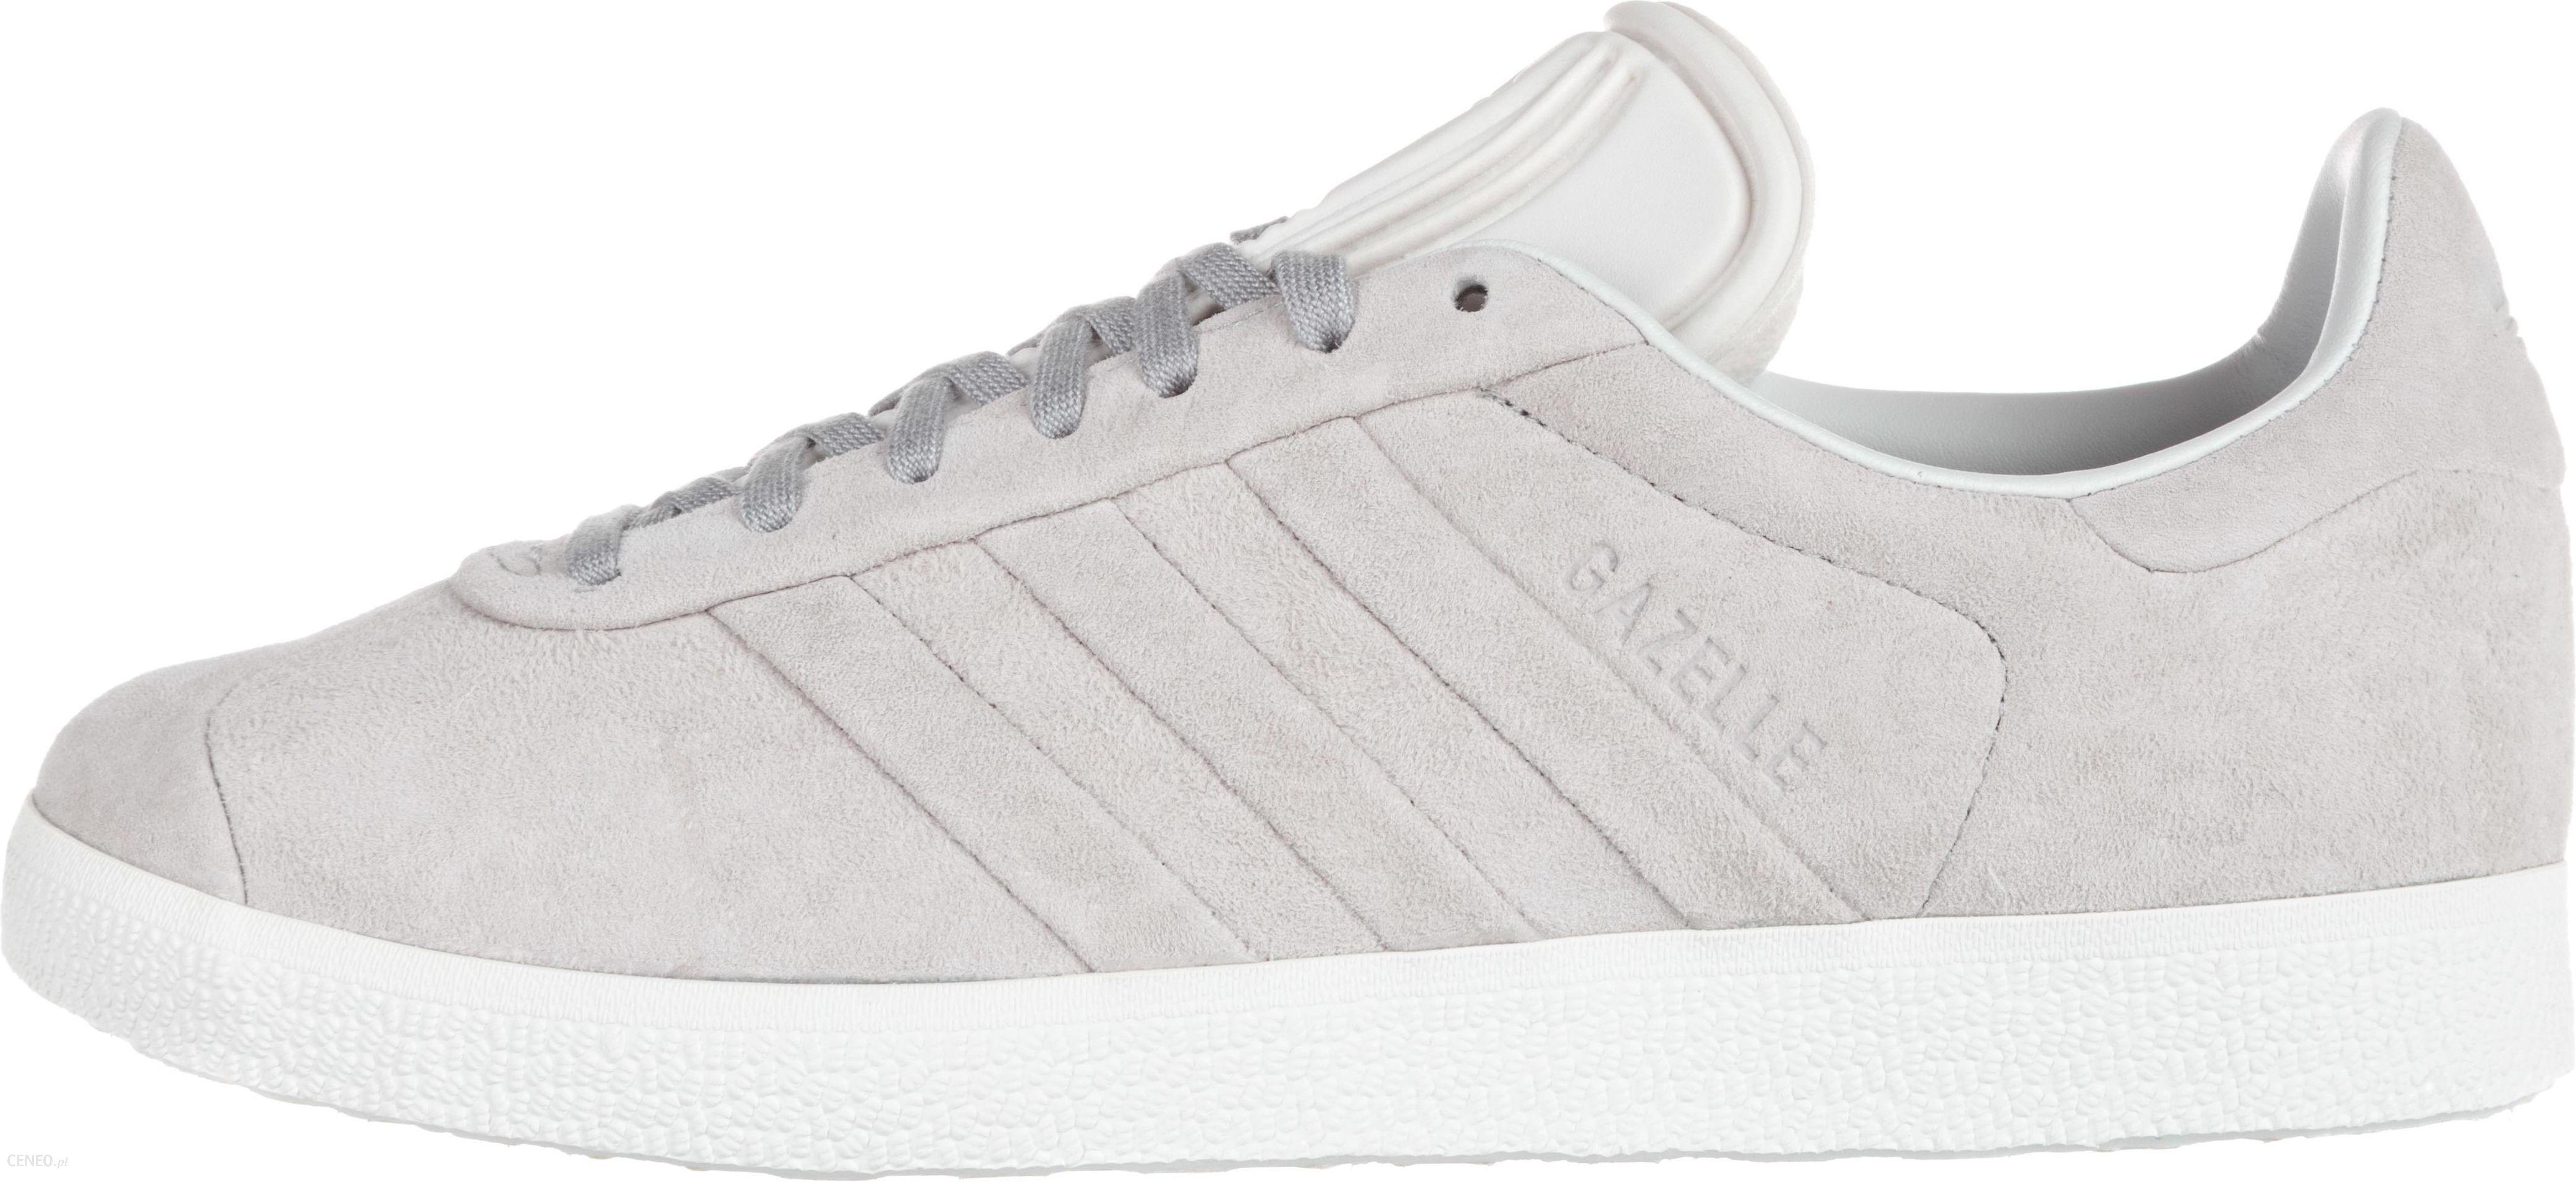 adidas Originals Gazelle Stitch and Turn Tenisówki Szary 38